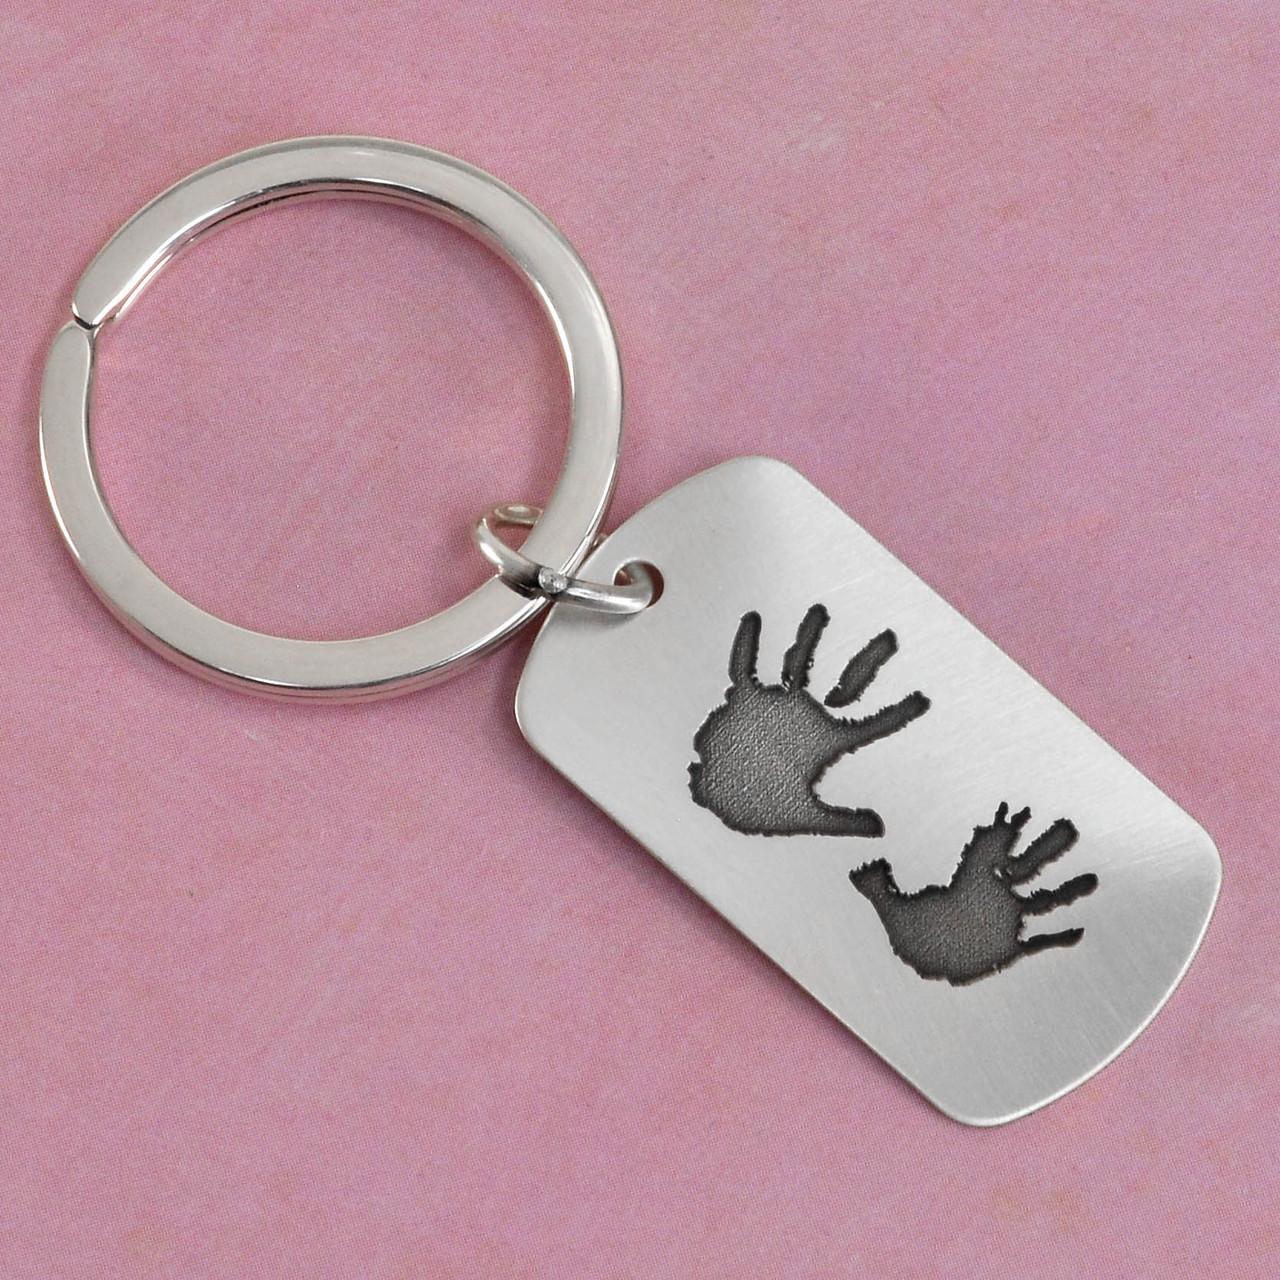 Hand prints on a key ring